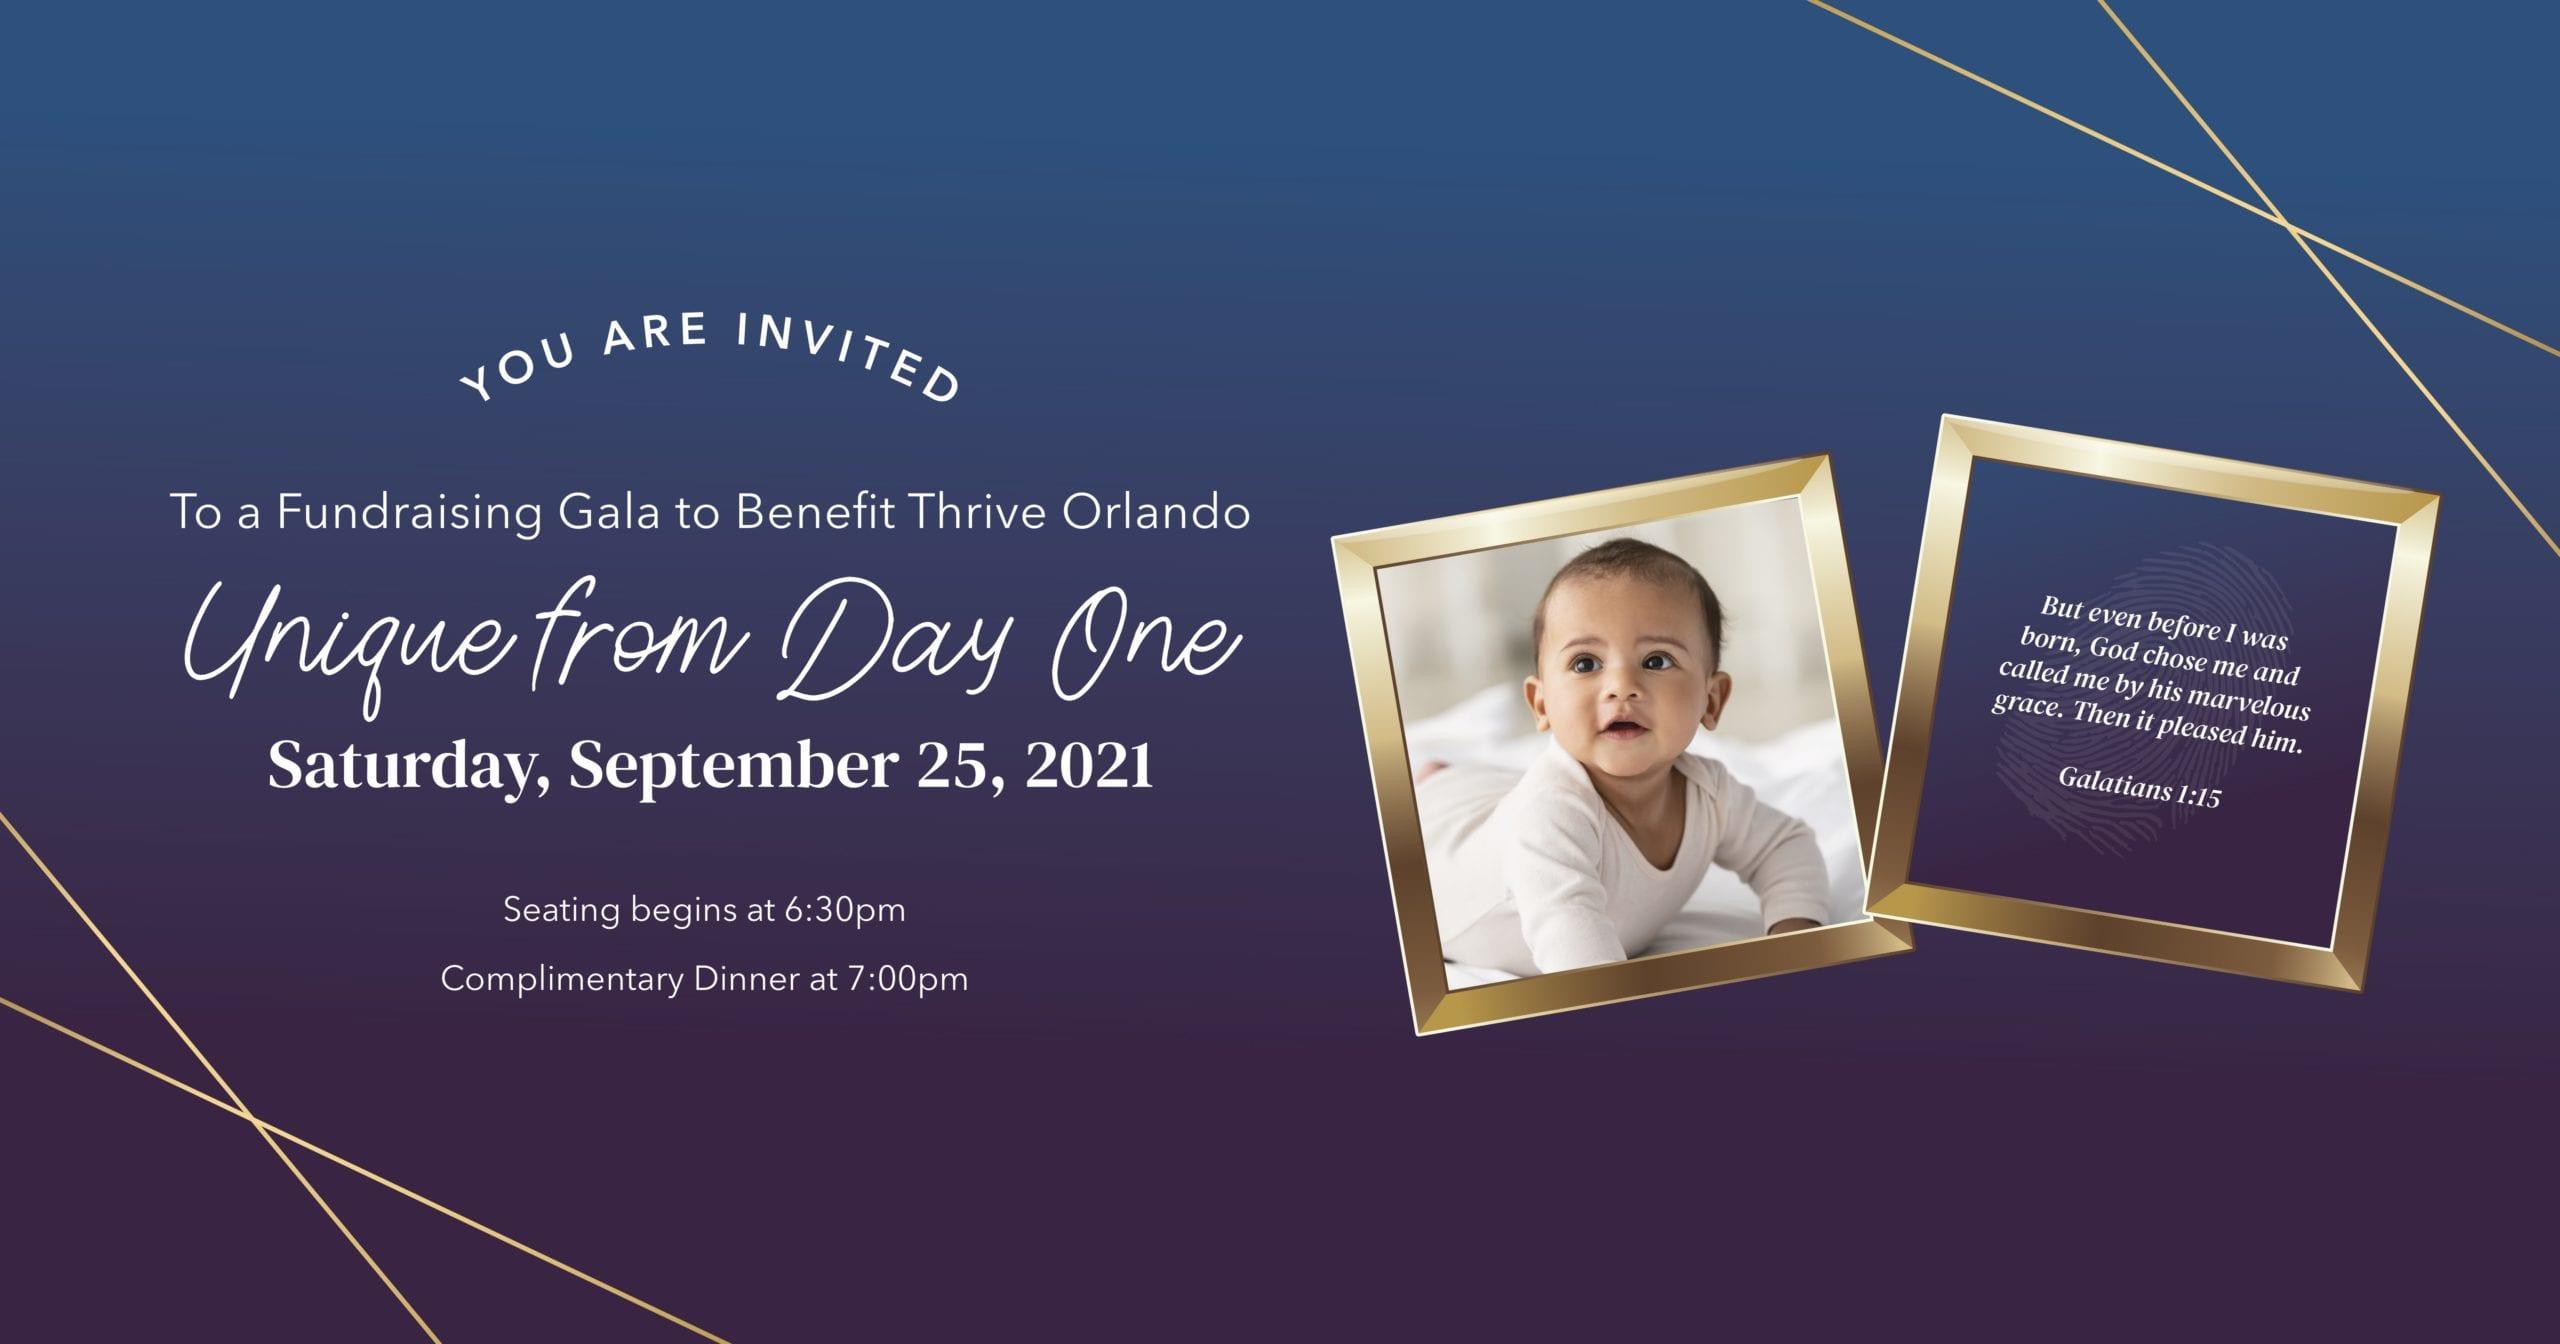 Virtual Gala Event for Thrive Orlando